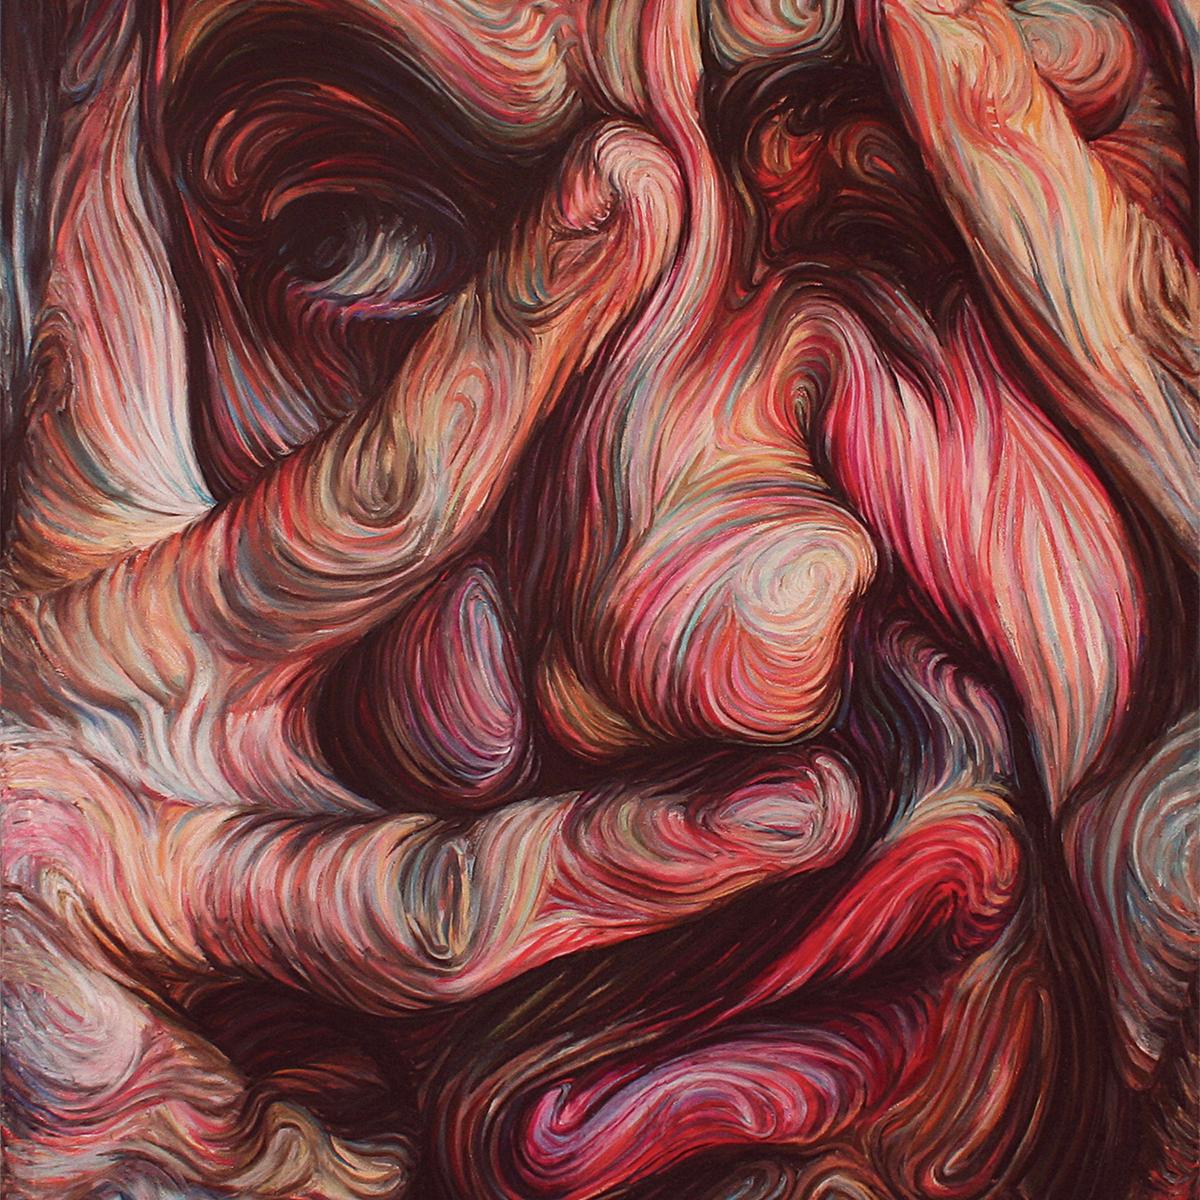 harmonic confusion cover art